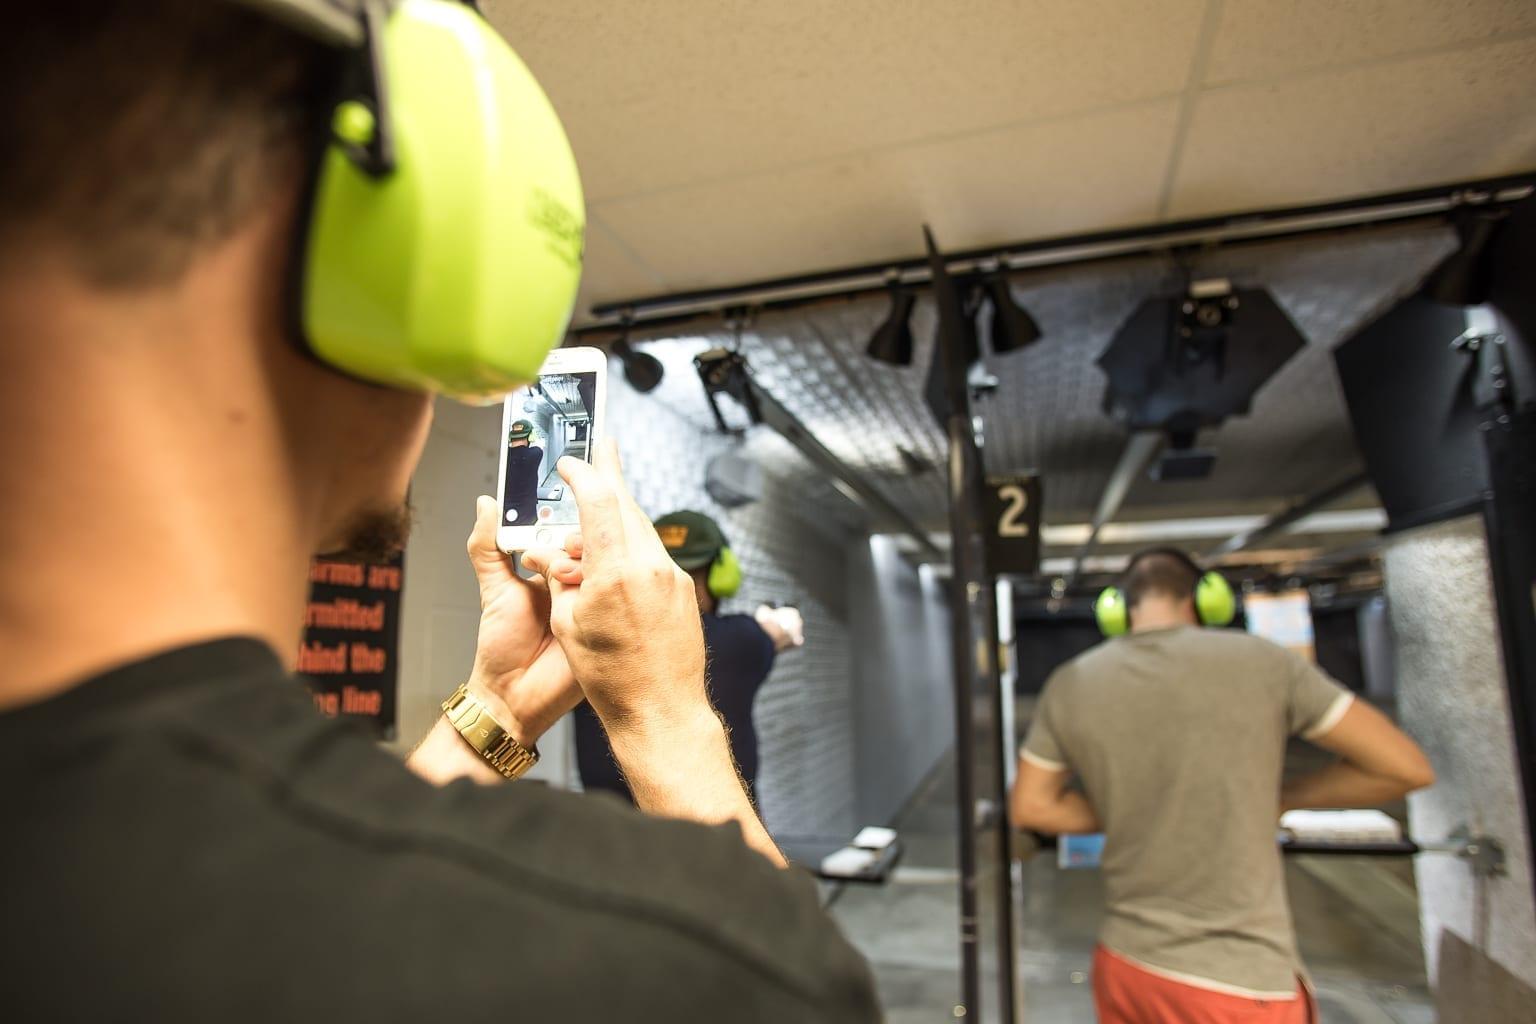 Shooting Range In Denver | Gun Range | Training and Retail Center